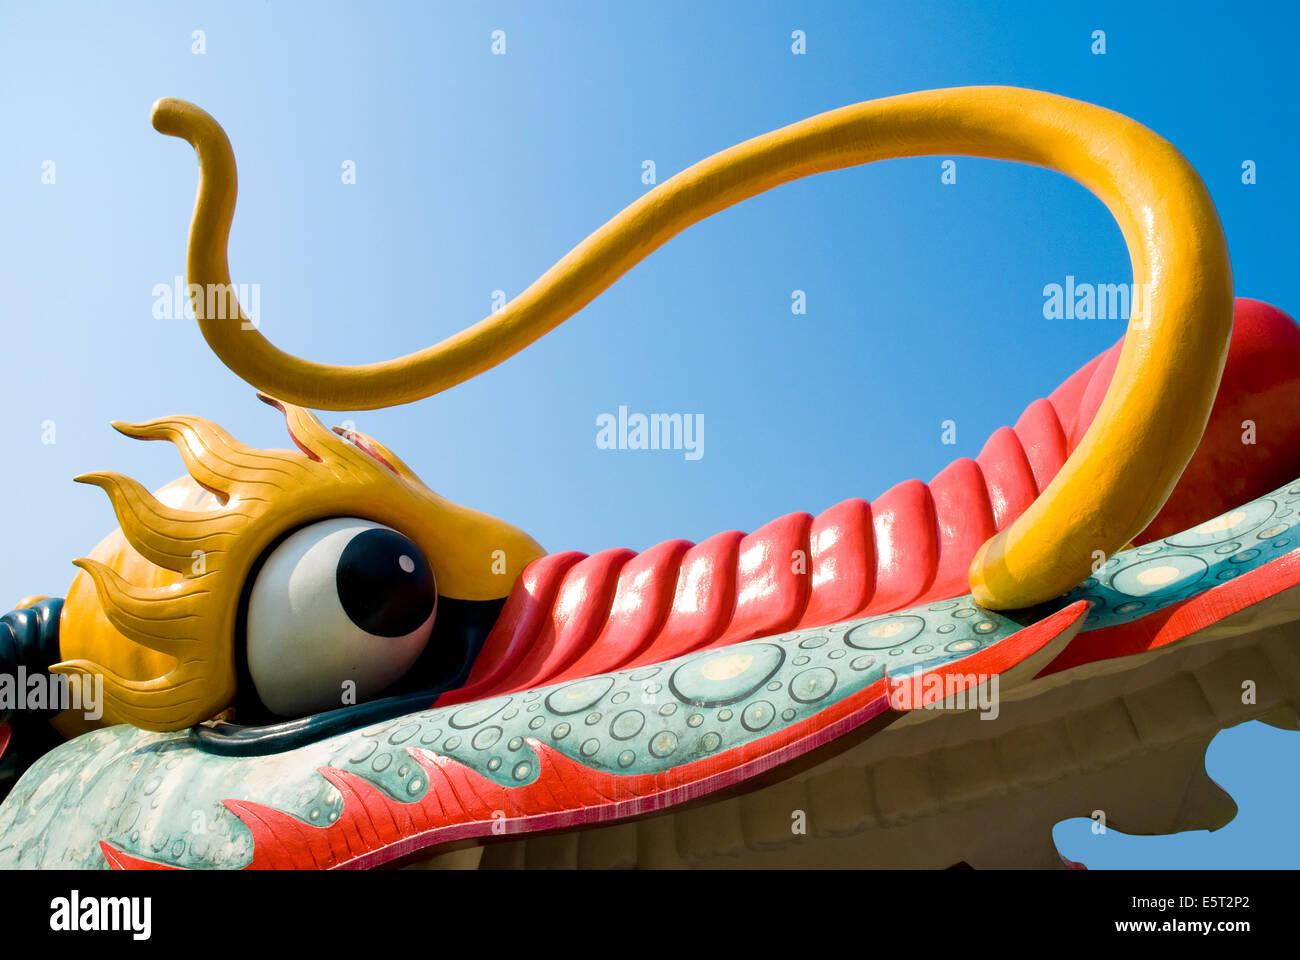 Dragon eye - Stock Image